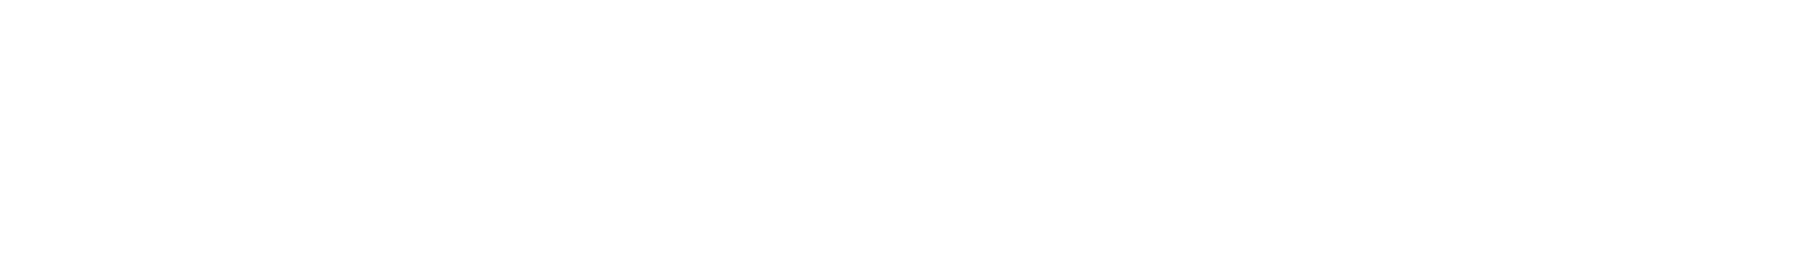 75bpmfluteloop